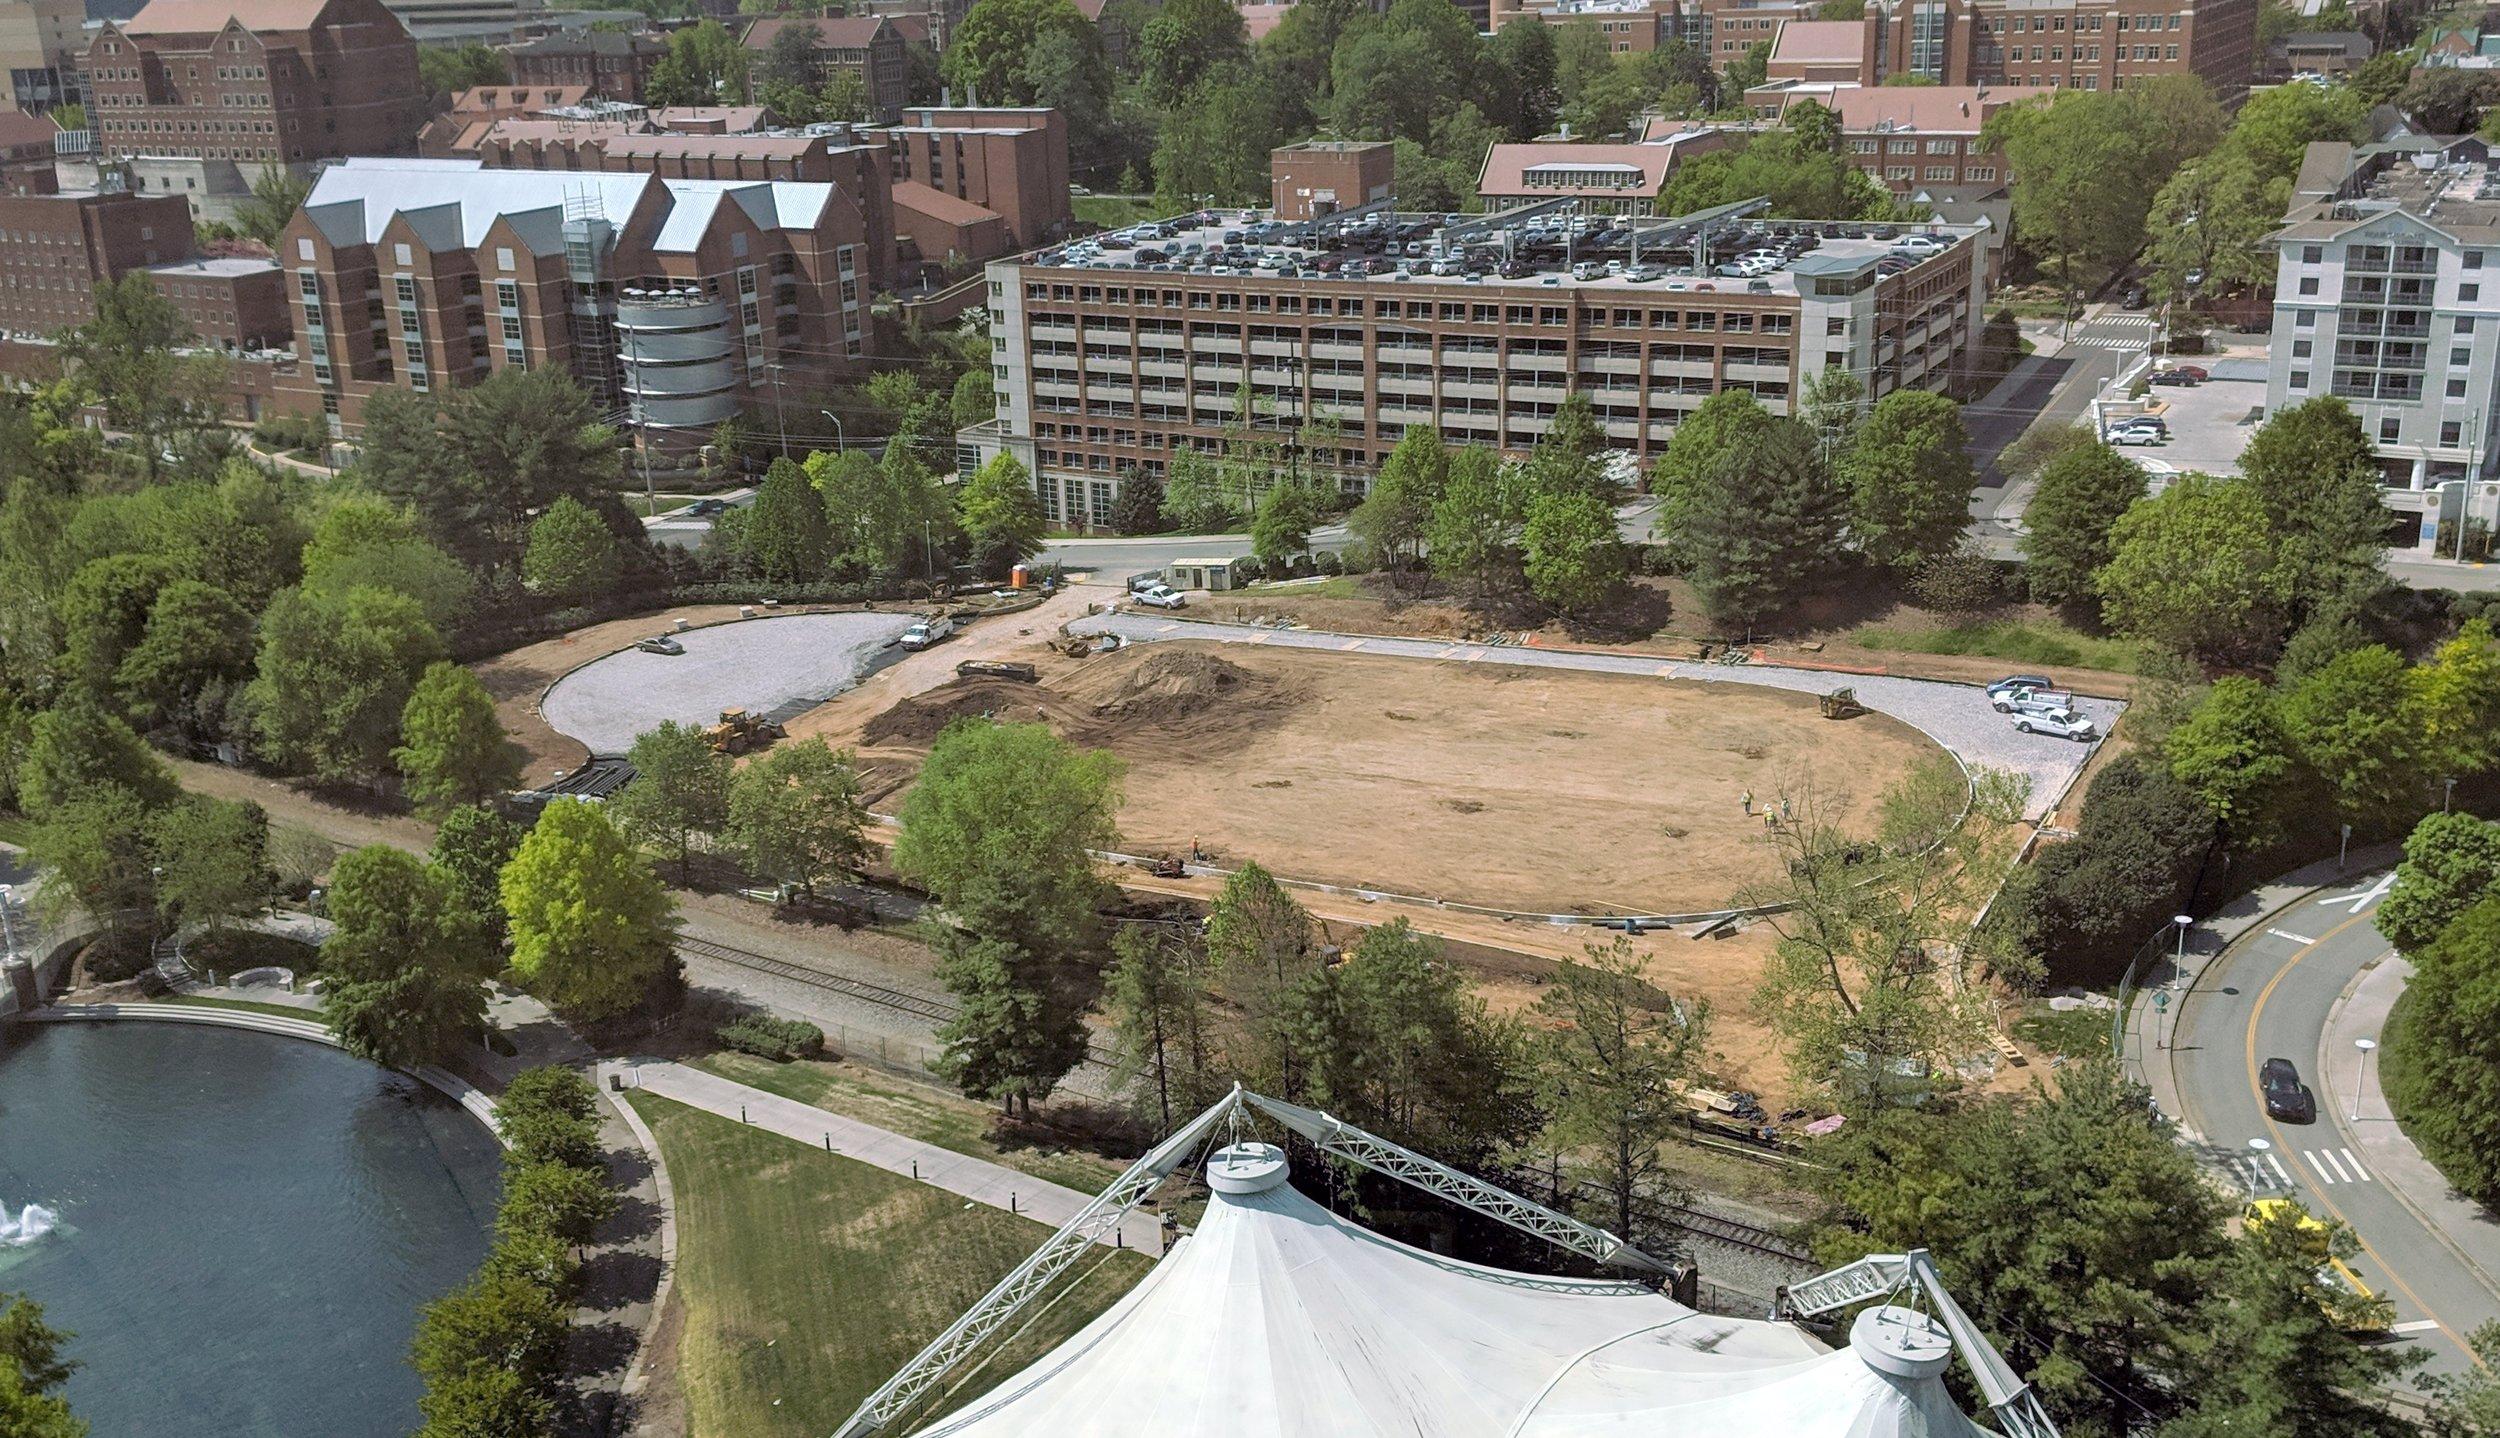 April 18, 2019 -- Concrete Curbing Complete; Permeable Paver Subbase Installation & Lawn Fine Grading Underway